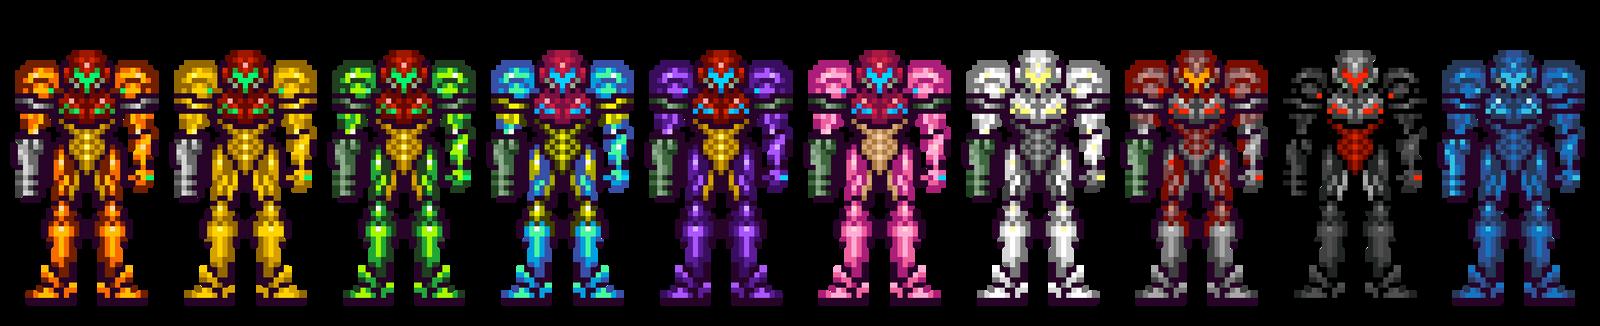 samus aran power suit alts by ninboy01 on deviantart